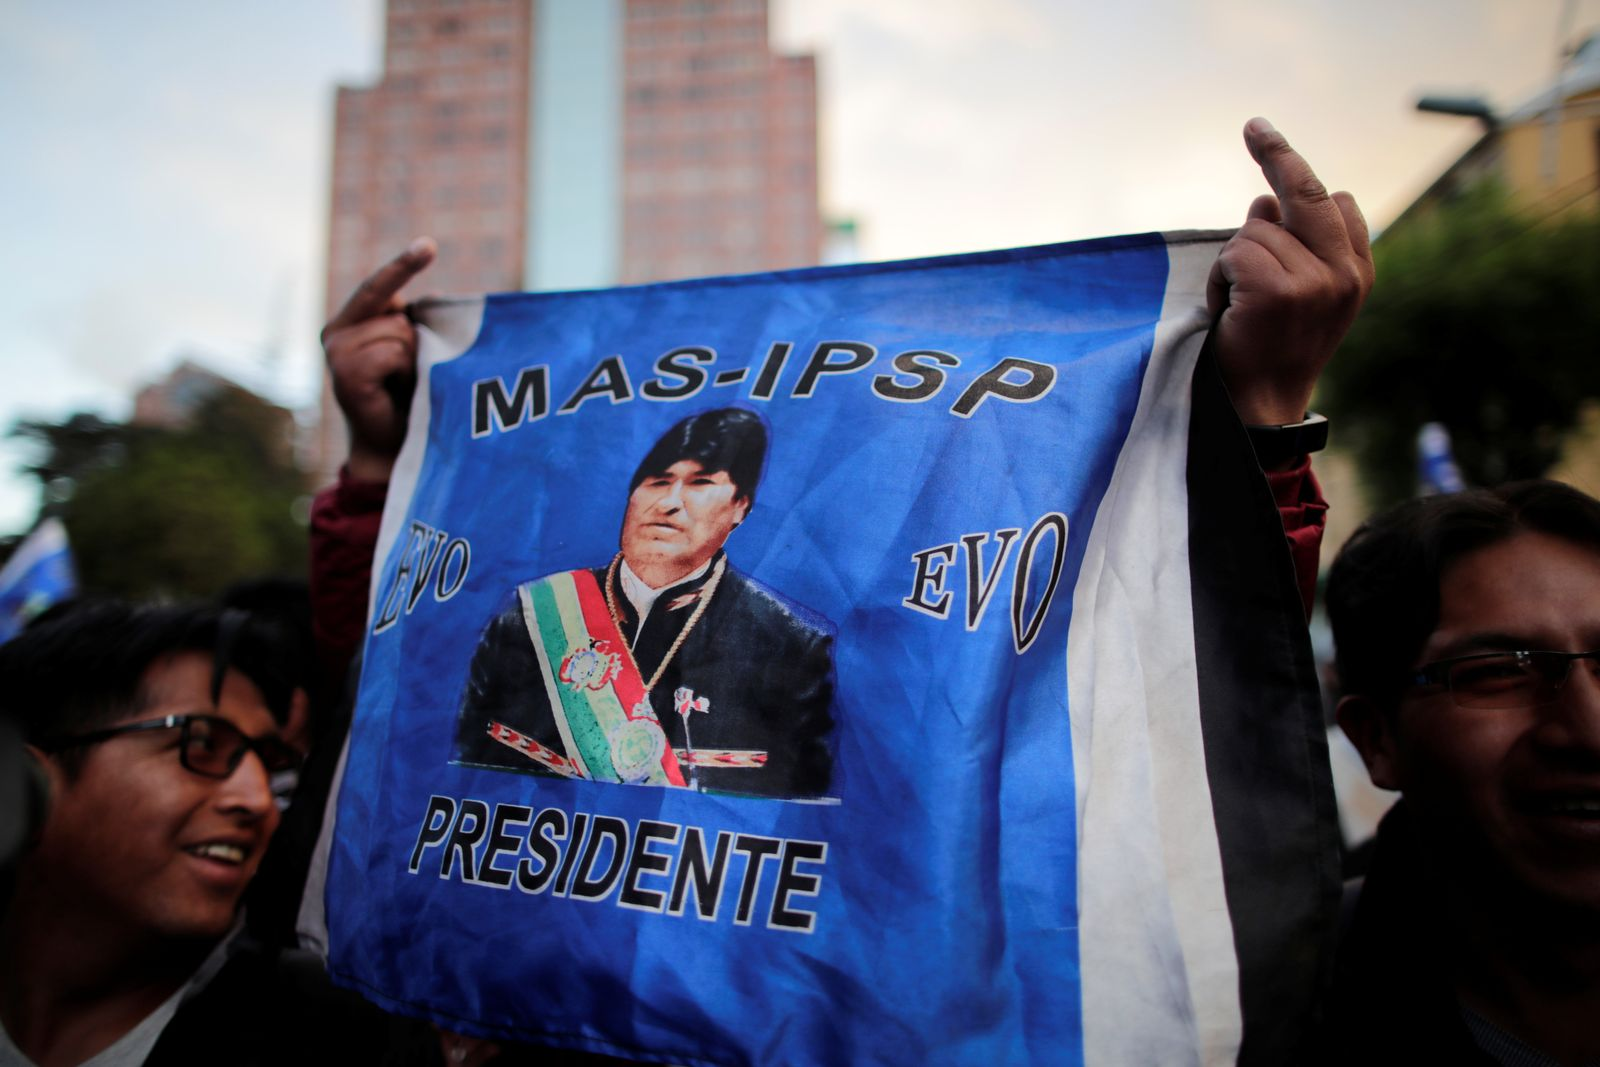 BOLIVIA-ELECTION/PROTEST